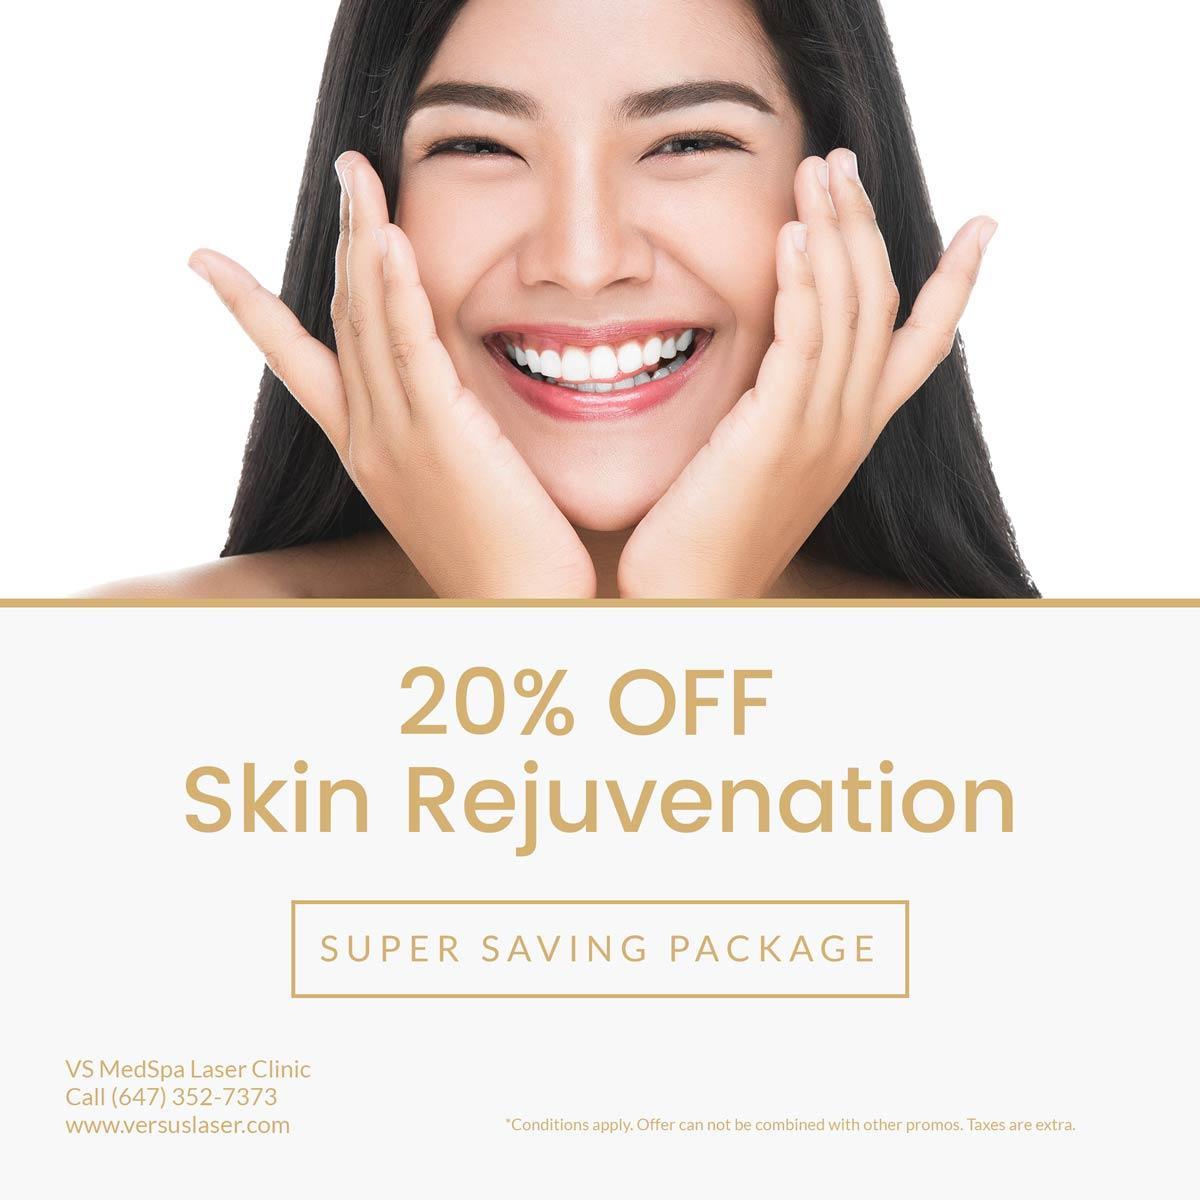 skin rejuvenation treatments sale